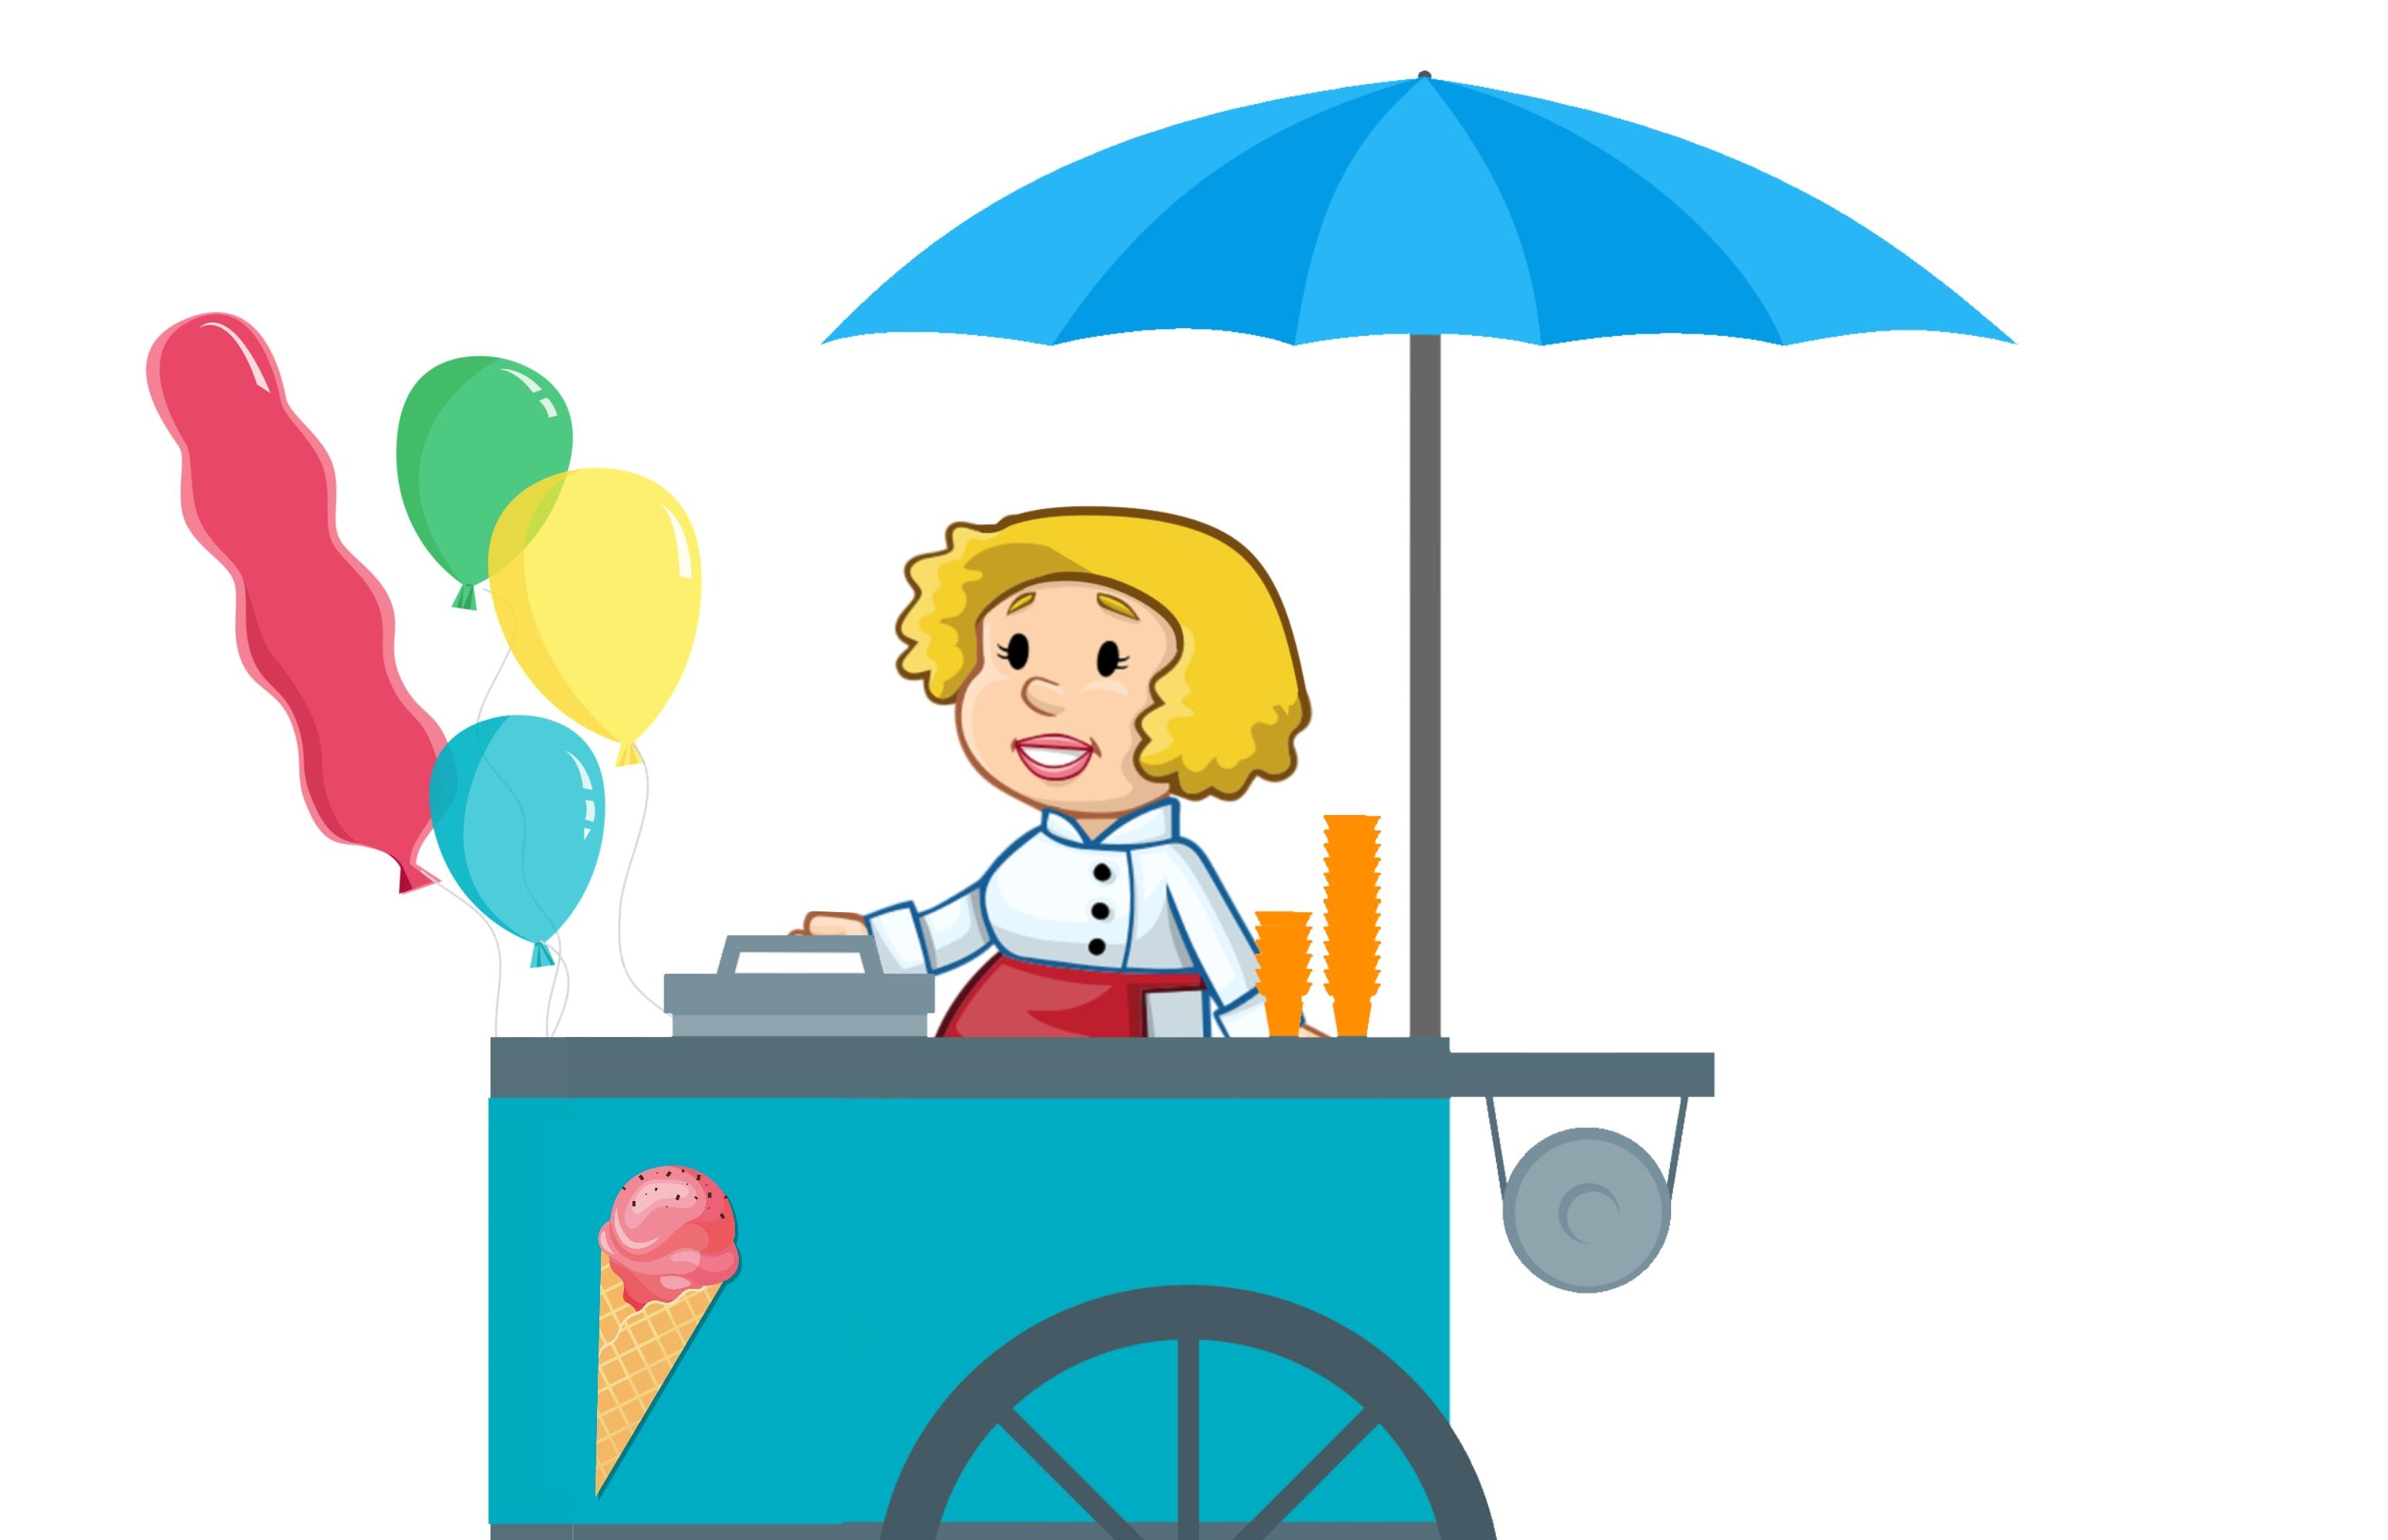 Gambar Es Krim Gerobak Wanita Kafe Lezat Fun Ice Kios Pasar Outdoor Penjual Penjualan Berdiri Jalan Musim Panas Meja Troli Mobil Van Vanila Kereta Balon Gambar Kartun Pirus Clip Art Ilustrasi